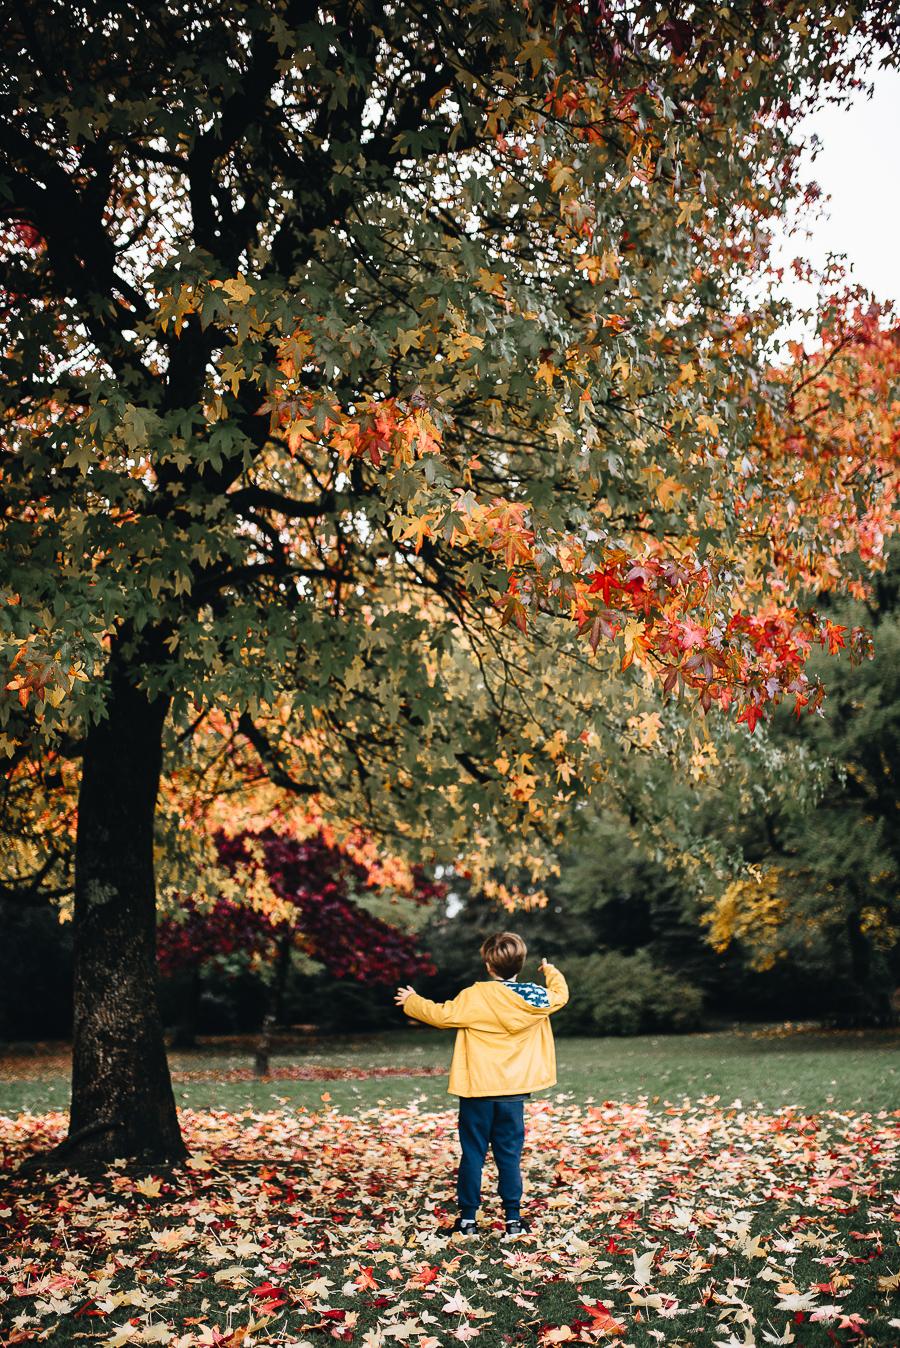 OurBeautifulAdventure-GettingOutdoorsinWales-October-websize-0193.jpg